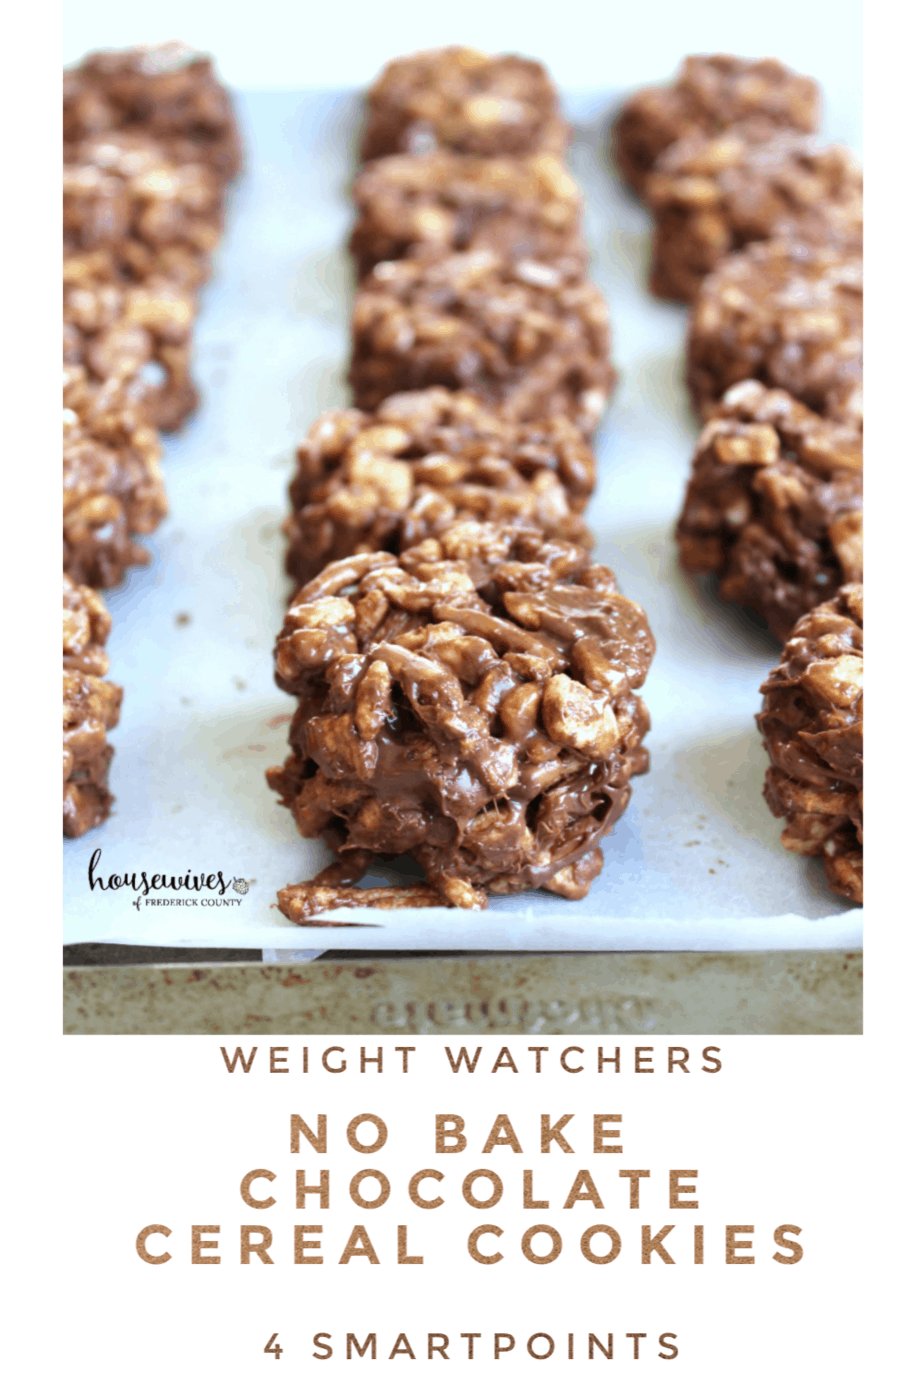 Weight Watchers No Bake Chocolate Cereal Cookies - 4 SmartPoints